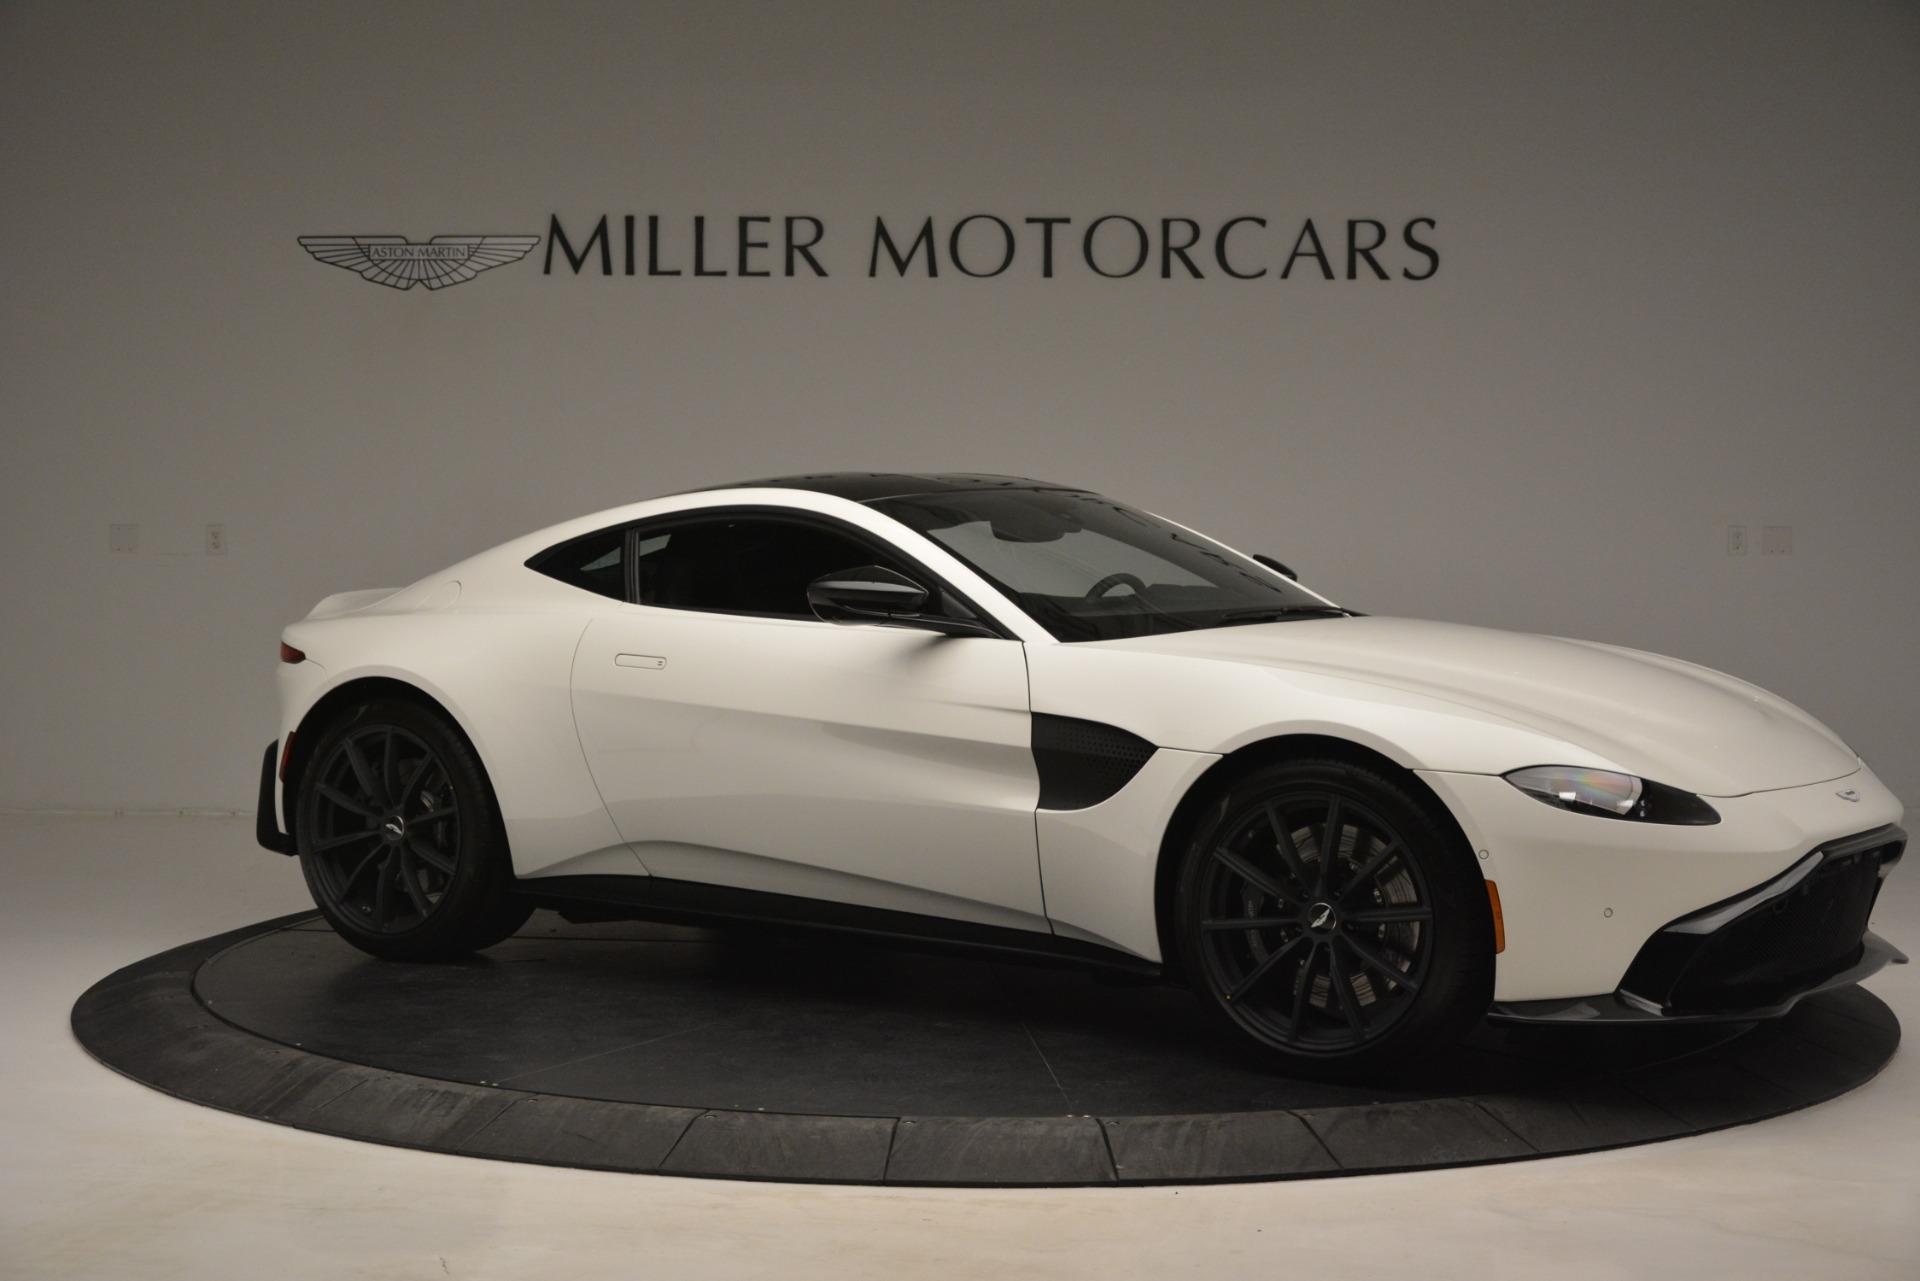 New 2019 Aston Martin Vantage  For Sale In Greenwich, CT 3053_p10